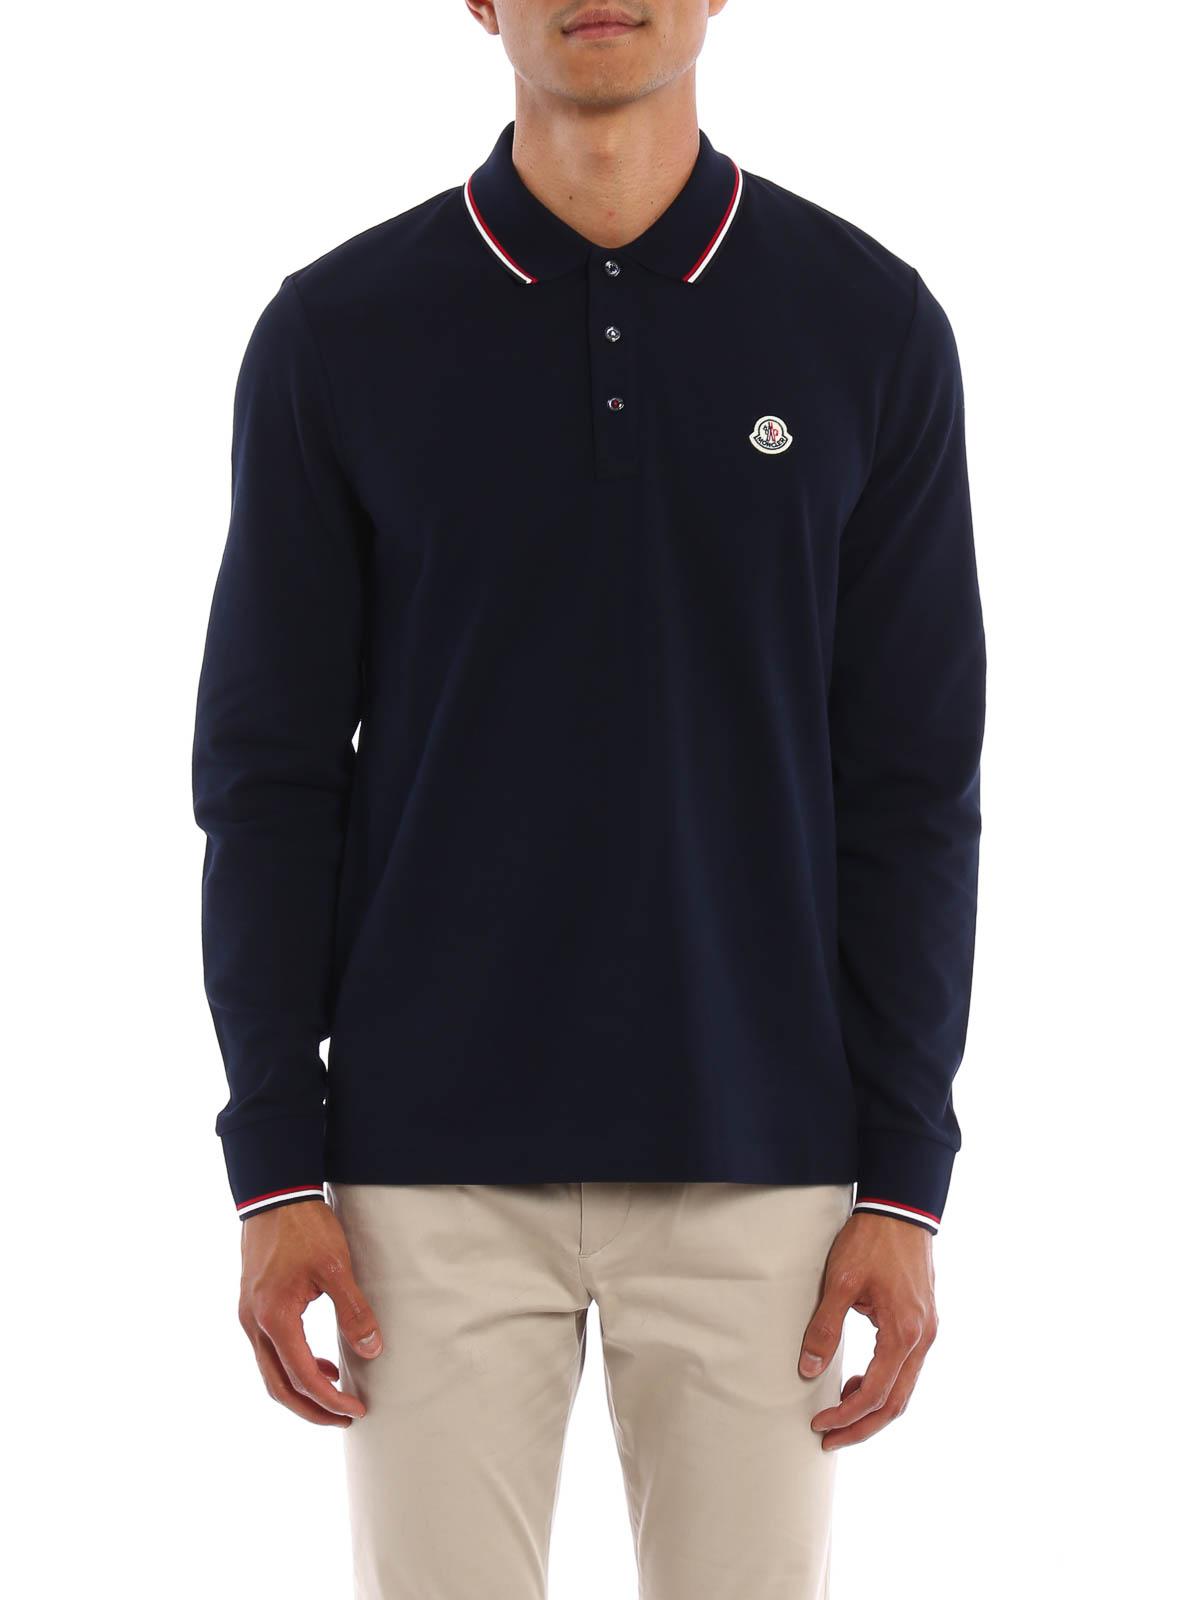 902ff396b Moncler - Long sleeved cotton polo shirt - polo shirts - B2 091 ...